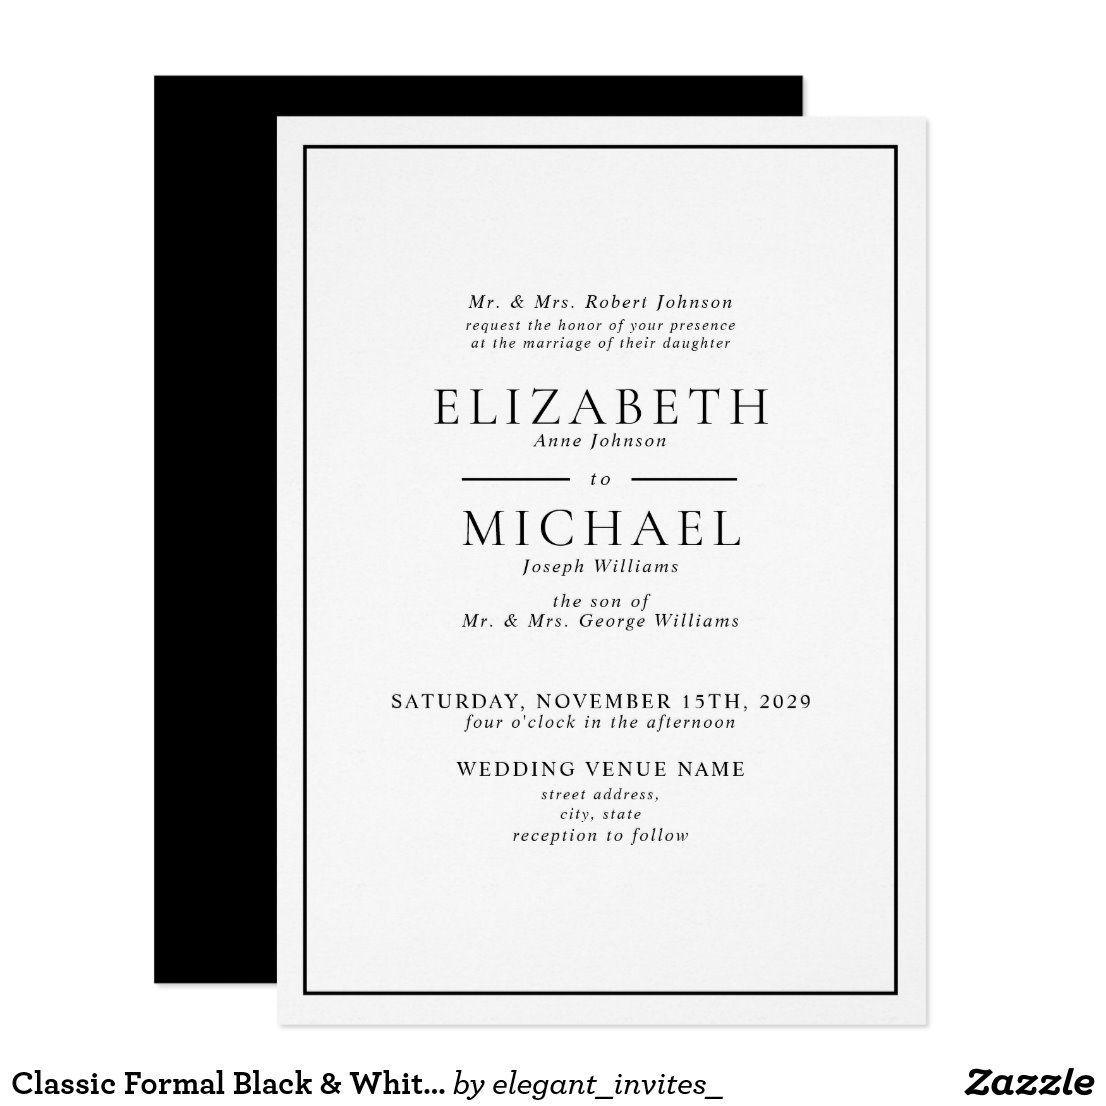 Classic Formal Black White Simple Wedding Invitation In 2020 Simple Wedding Invitations Black And White Wedding Invitations Black Tie Wedding Invitations